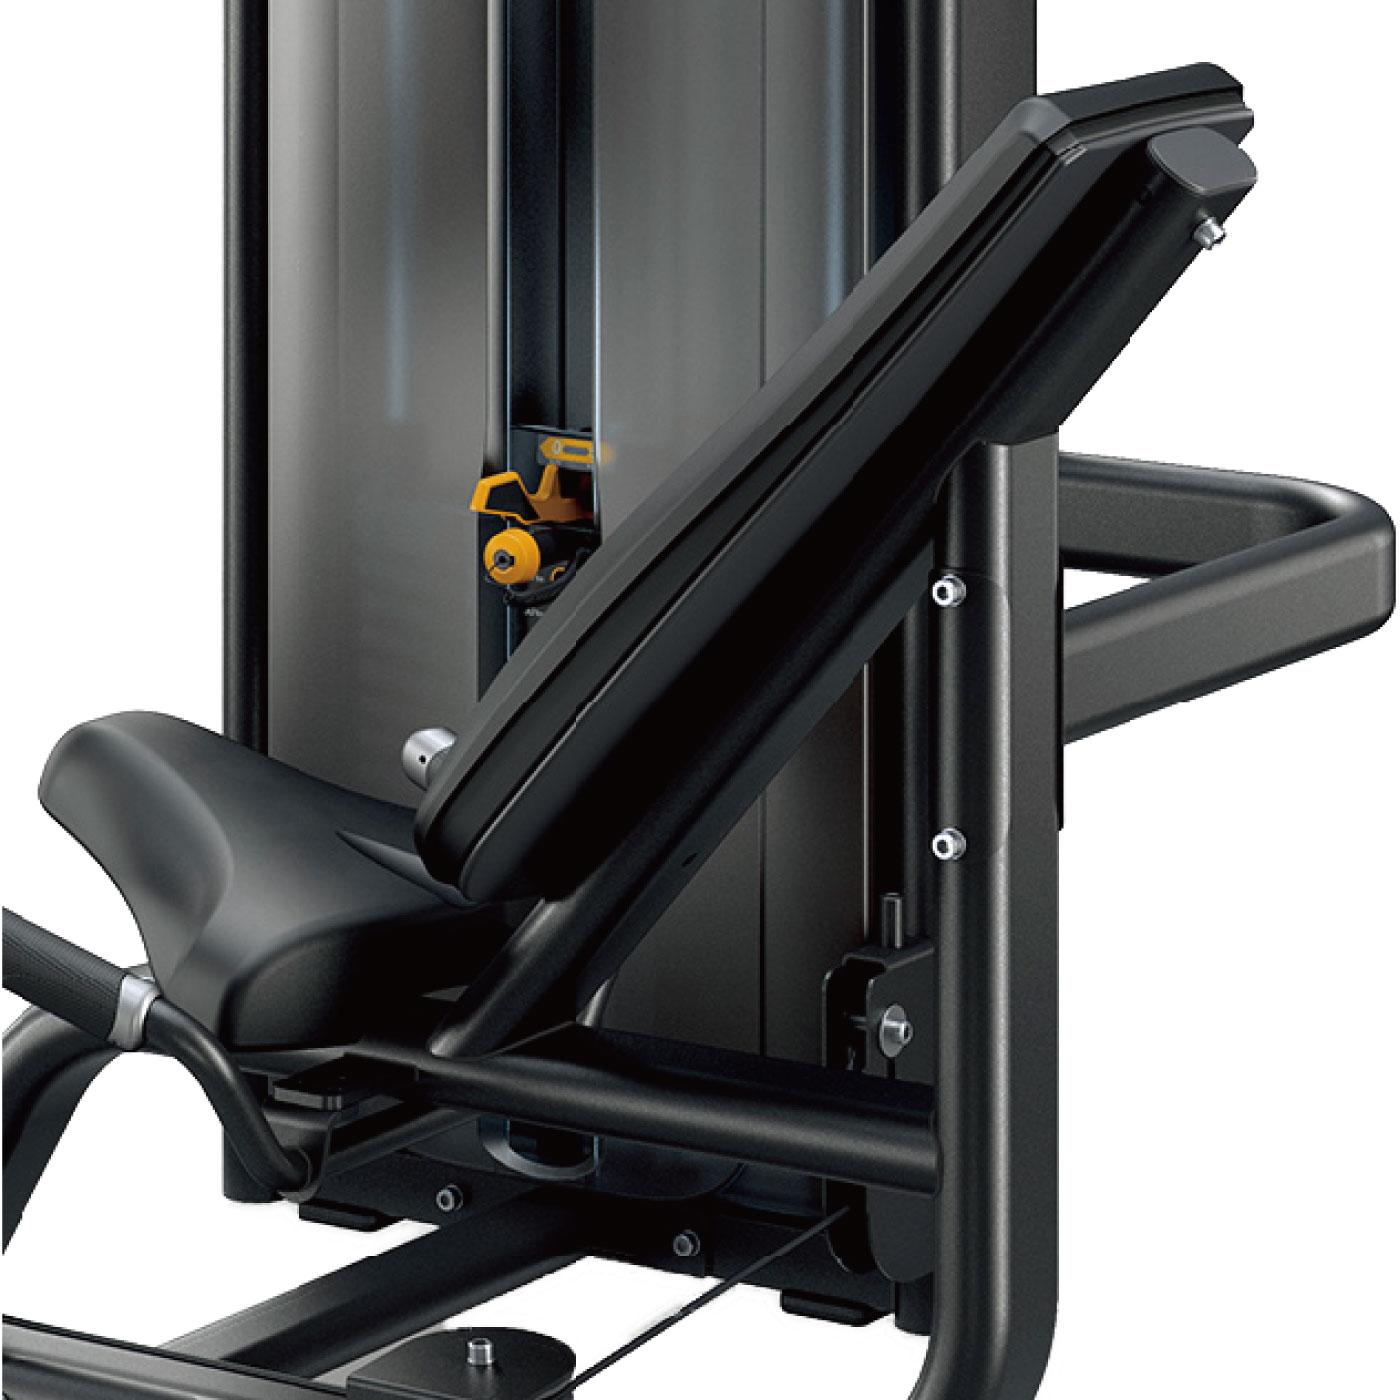 VS-S70(レッグプレス/カーフプレス)〈VERSAシリーズ〉/業務用ストレングスマシン〈業務用MATRIX〉《ジョンソンヘルステック》